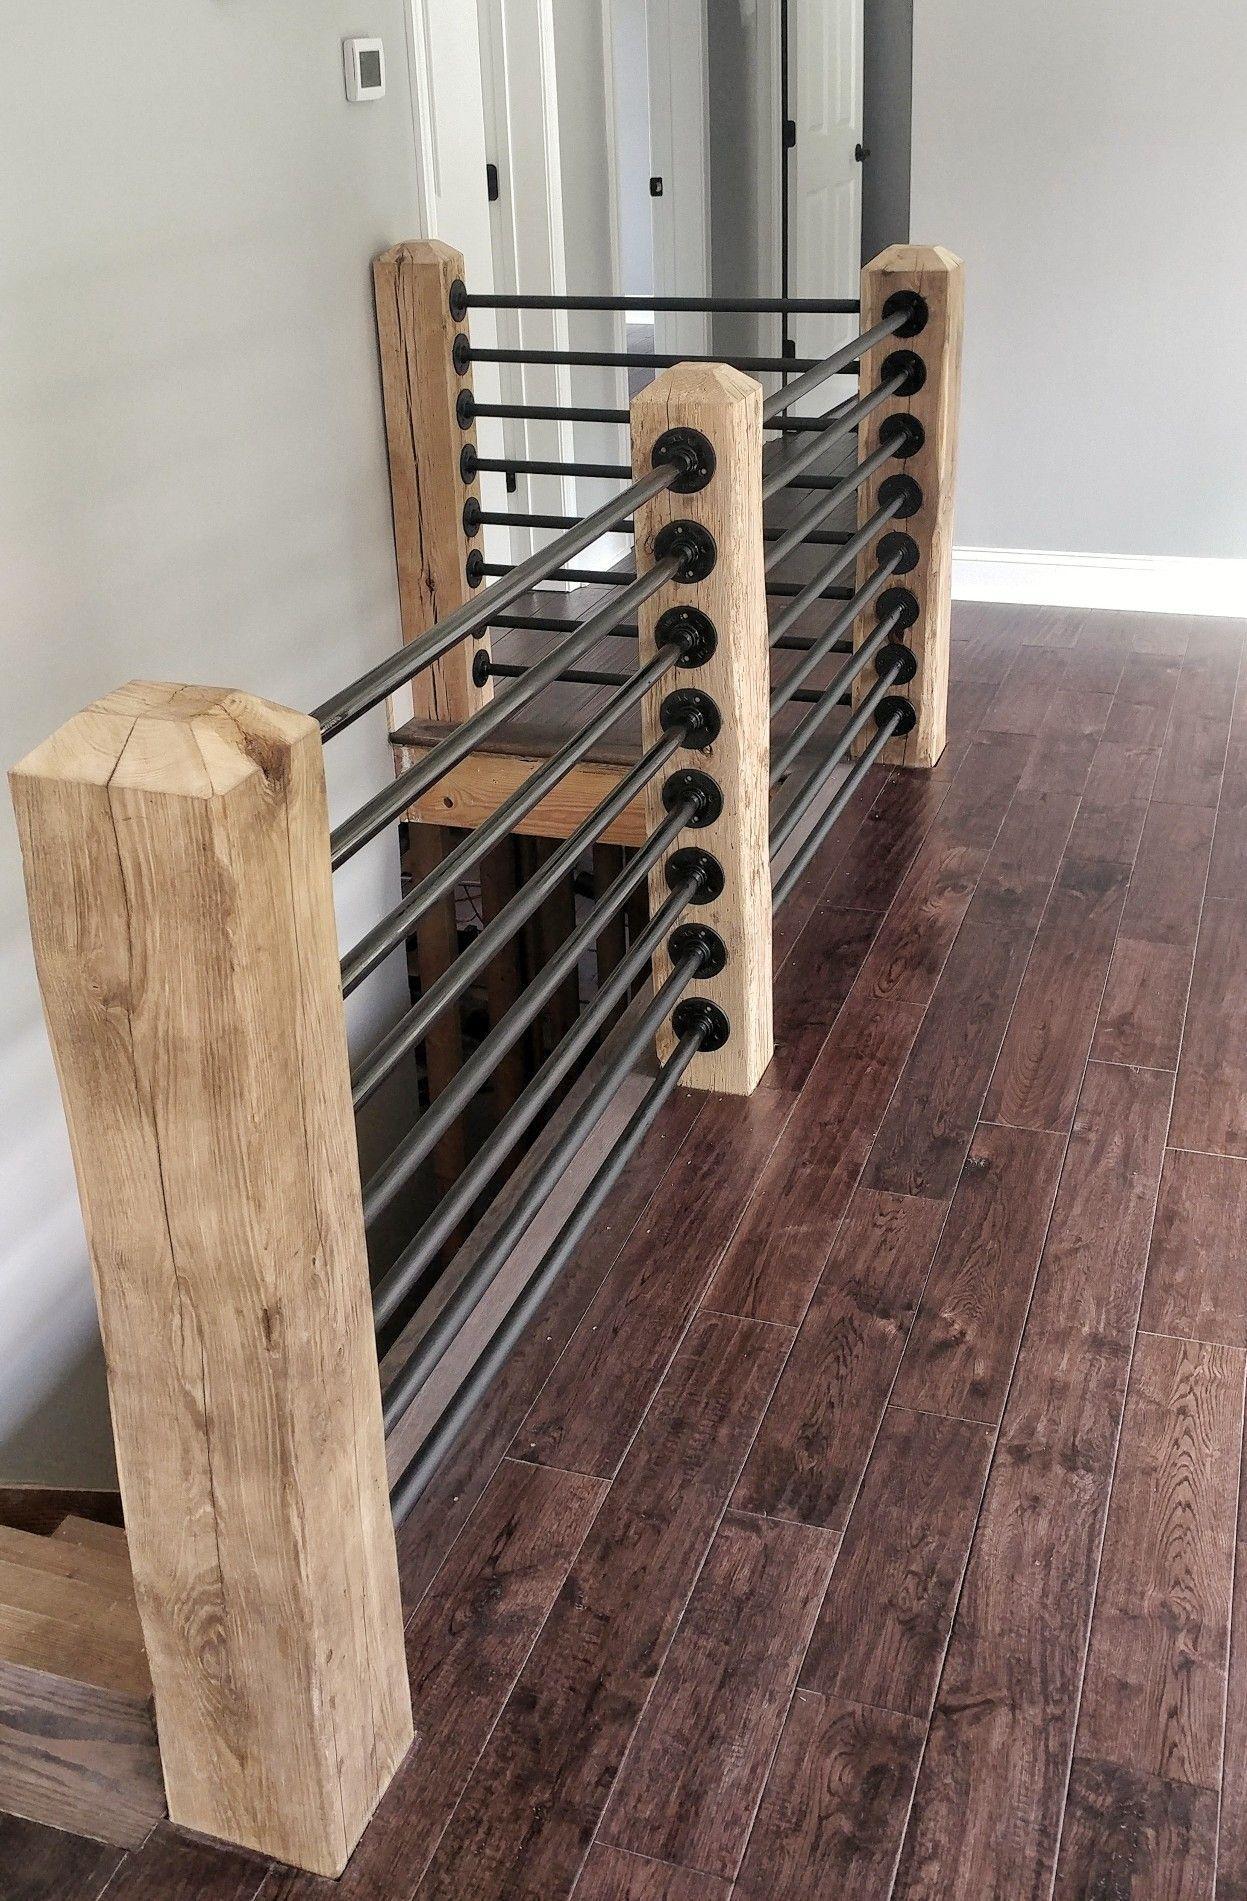 33 Diy Deck Railing Ideas Designs That Are Sure To Inspire You Homedecor Homedecorideas Backyardideas Diy Deck Railing Design Railing Design Diy Deck